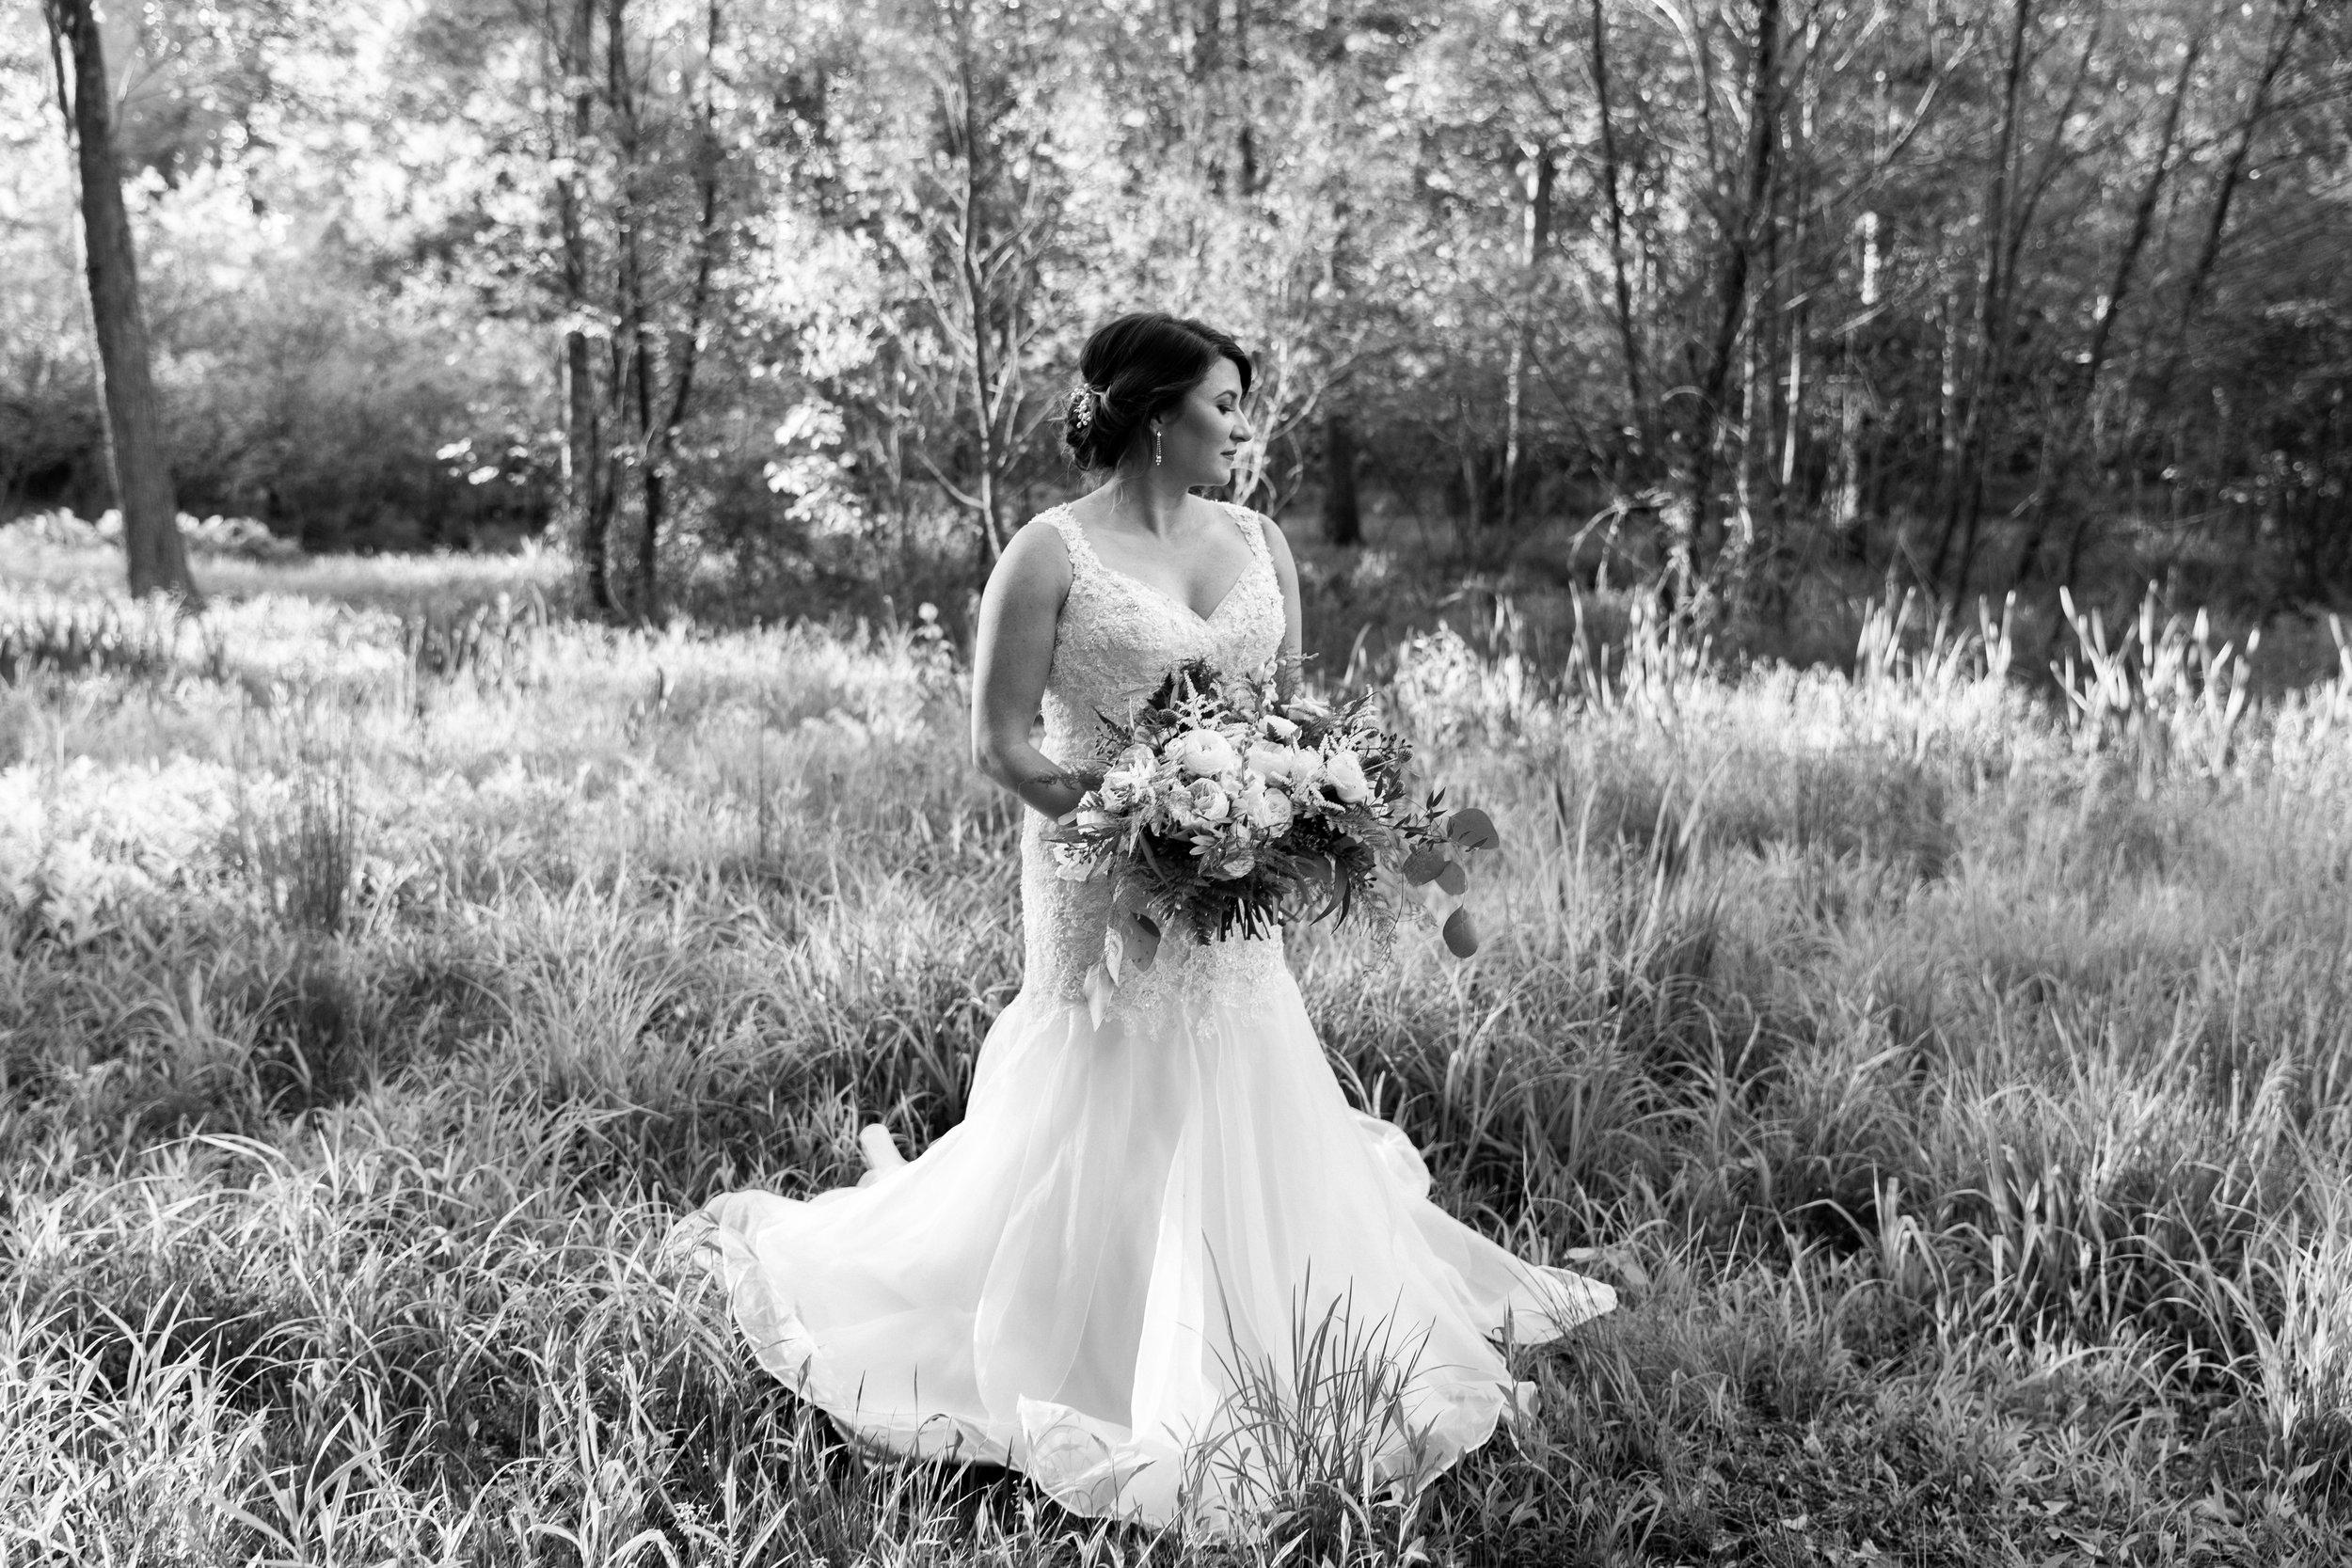 MelanieJoyBridal-6163.jpg